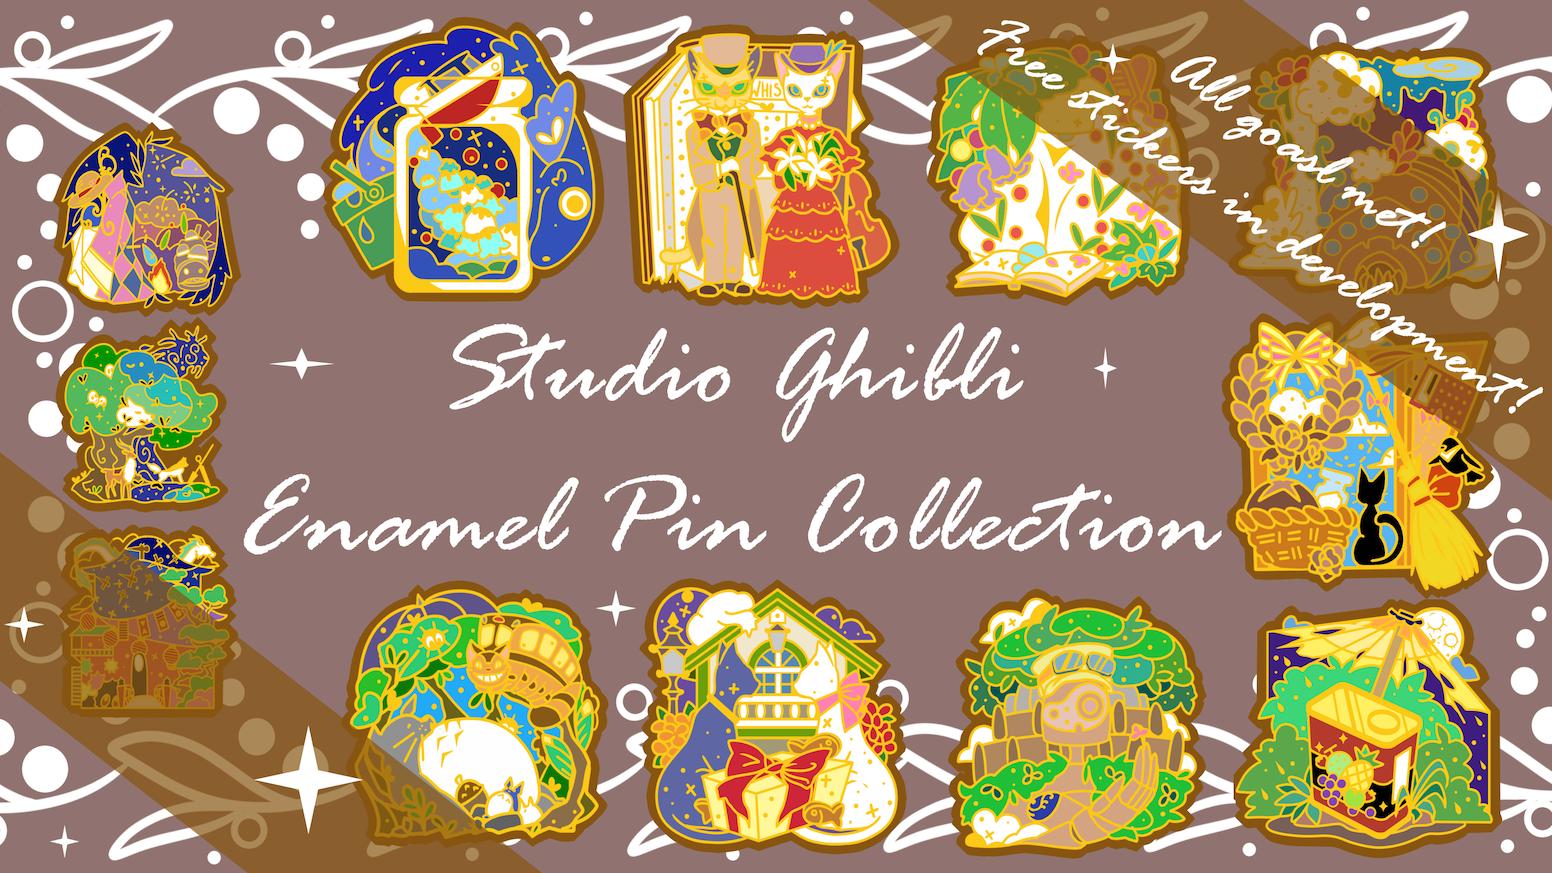 Continued Collection of Studio Ghibli Enamel Pins!